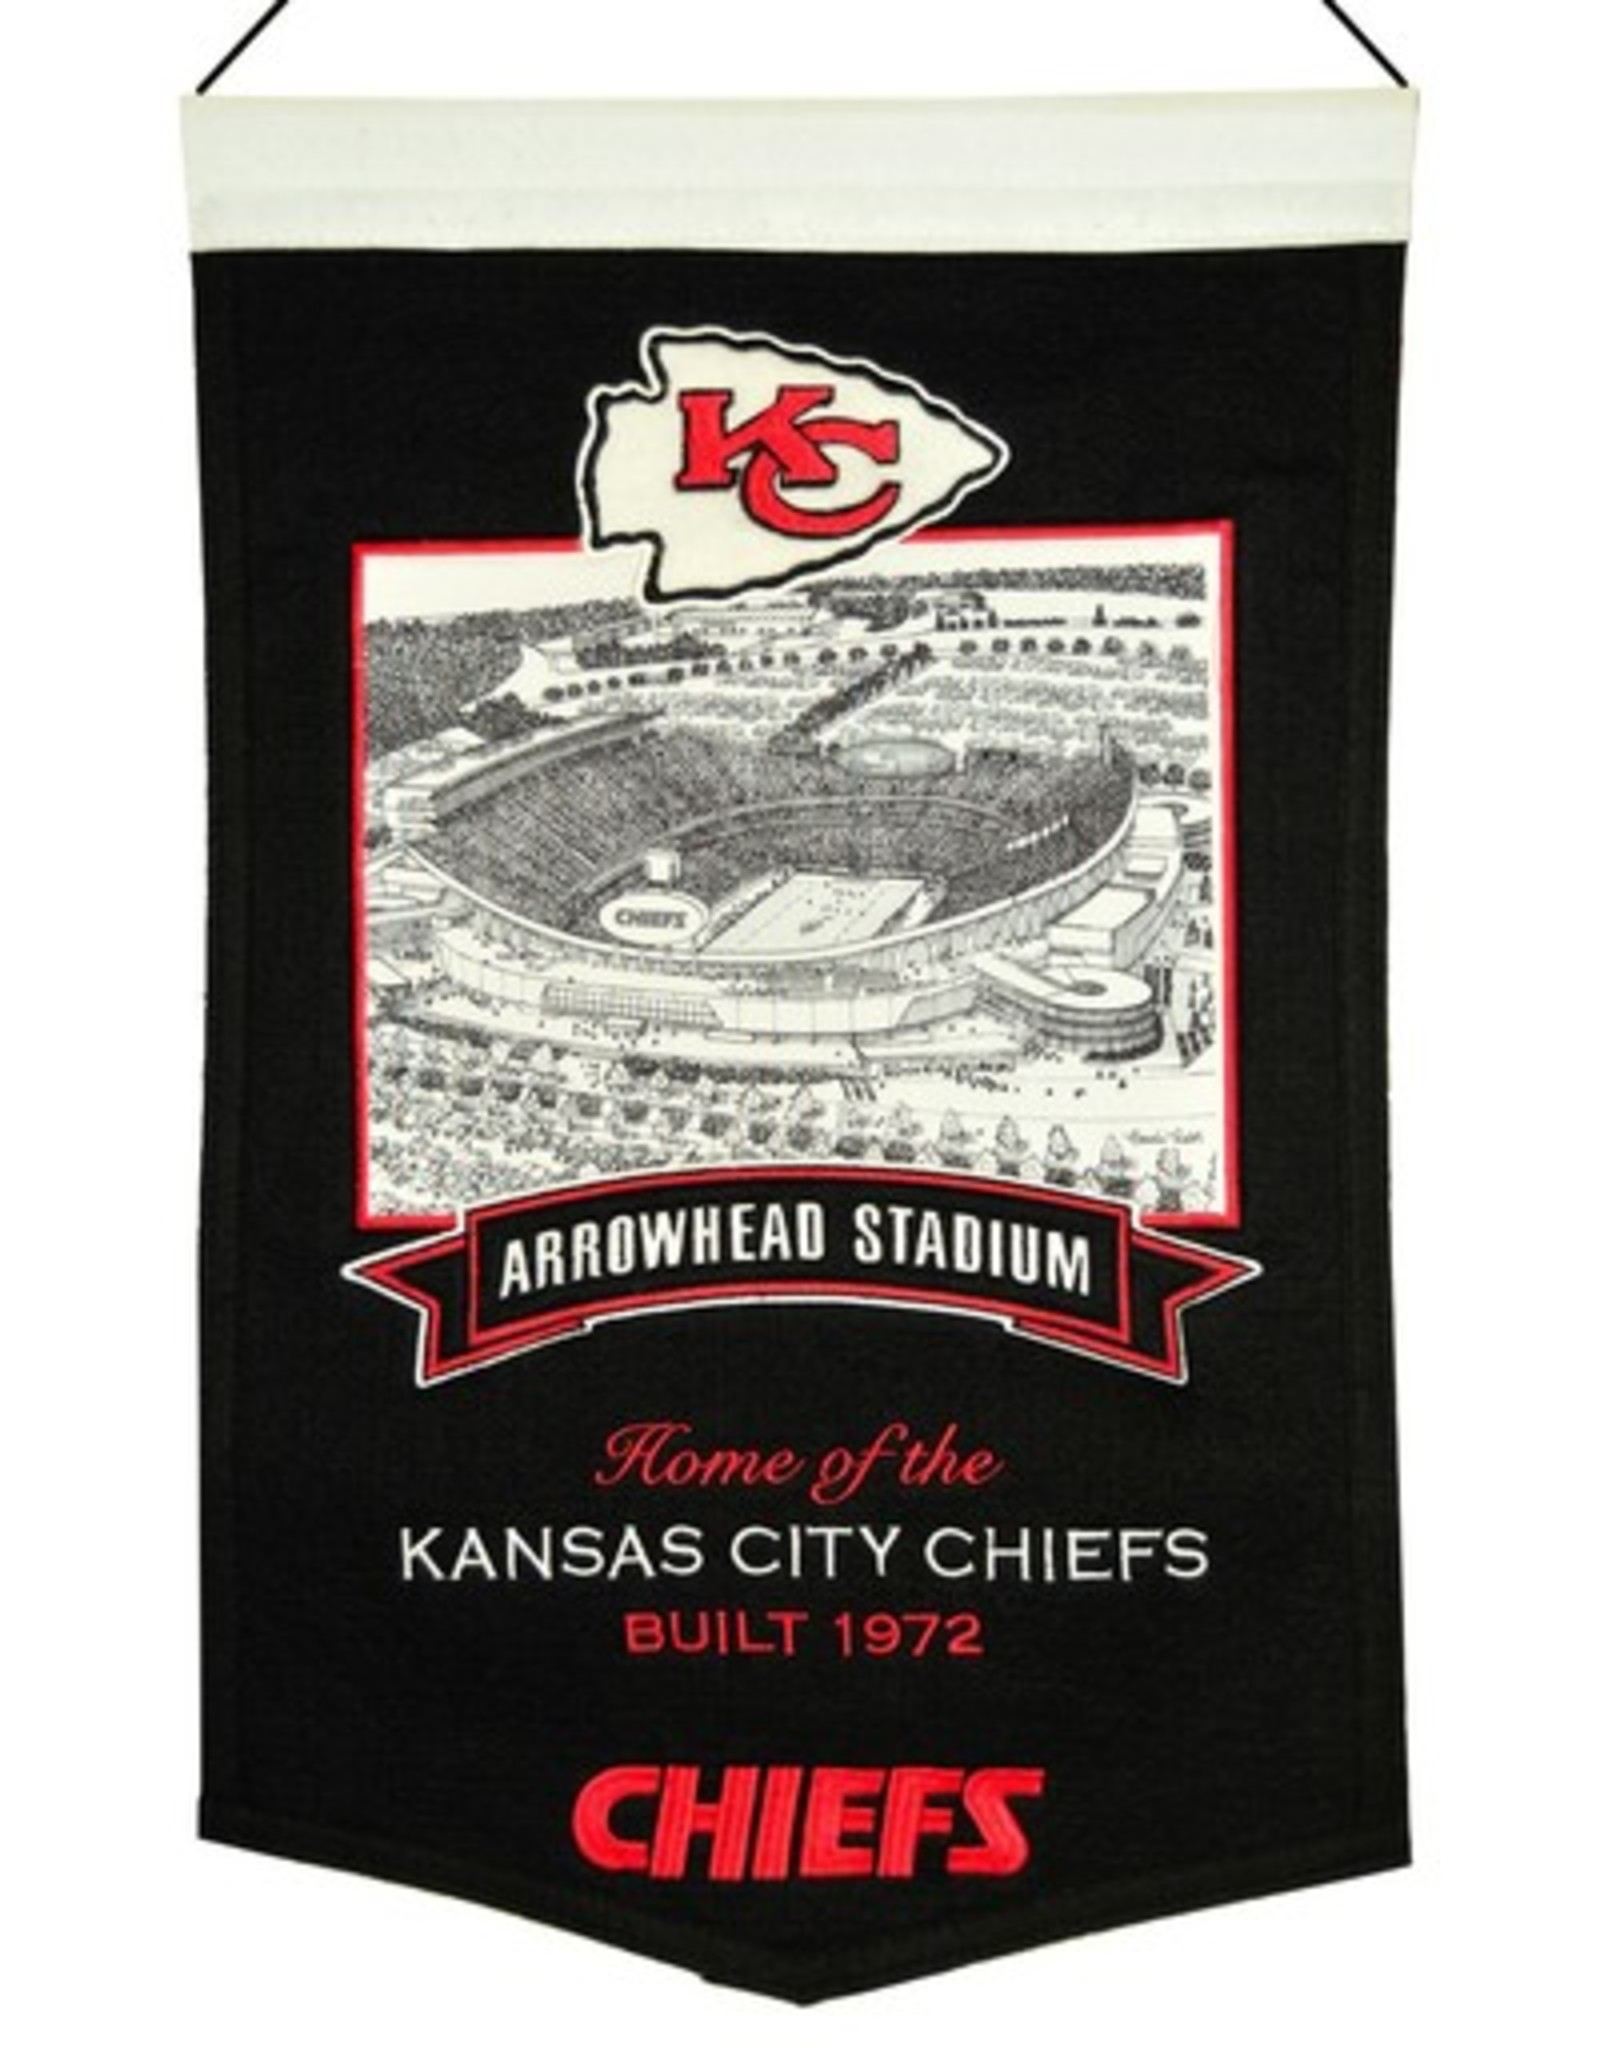 Kansas City Chiefs Arrowhead Stadium Banner